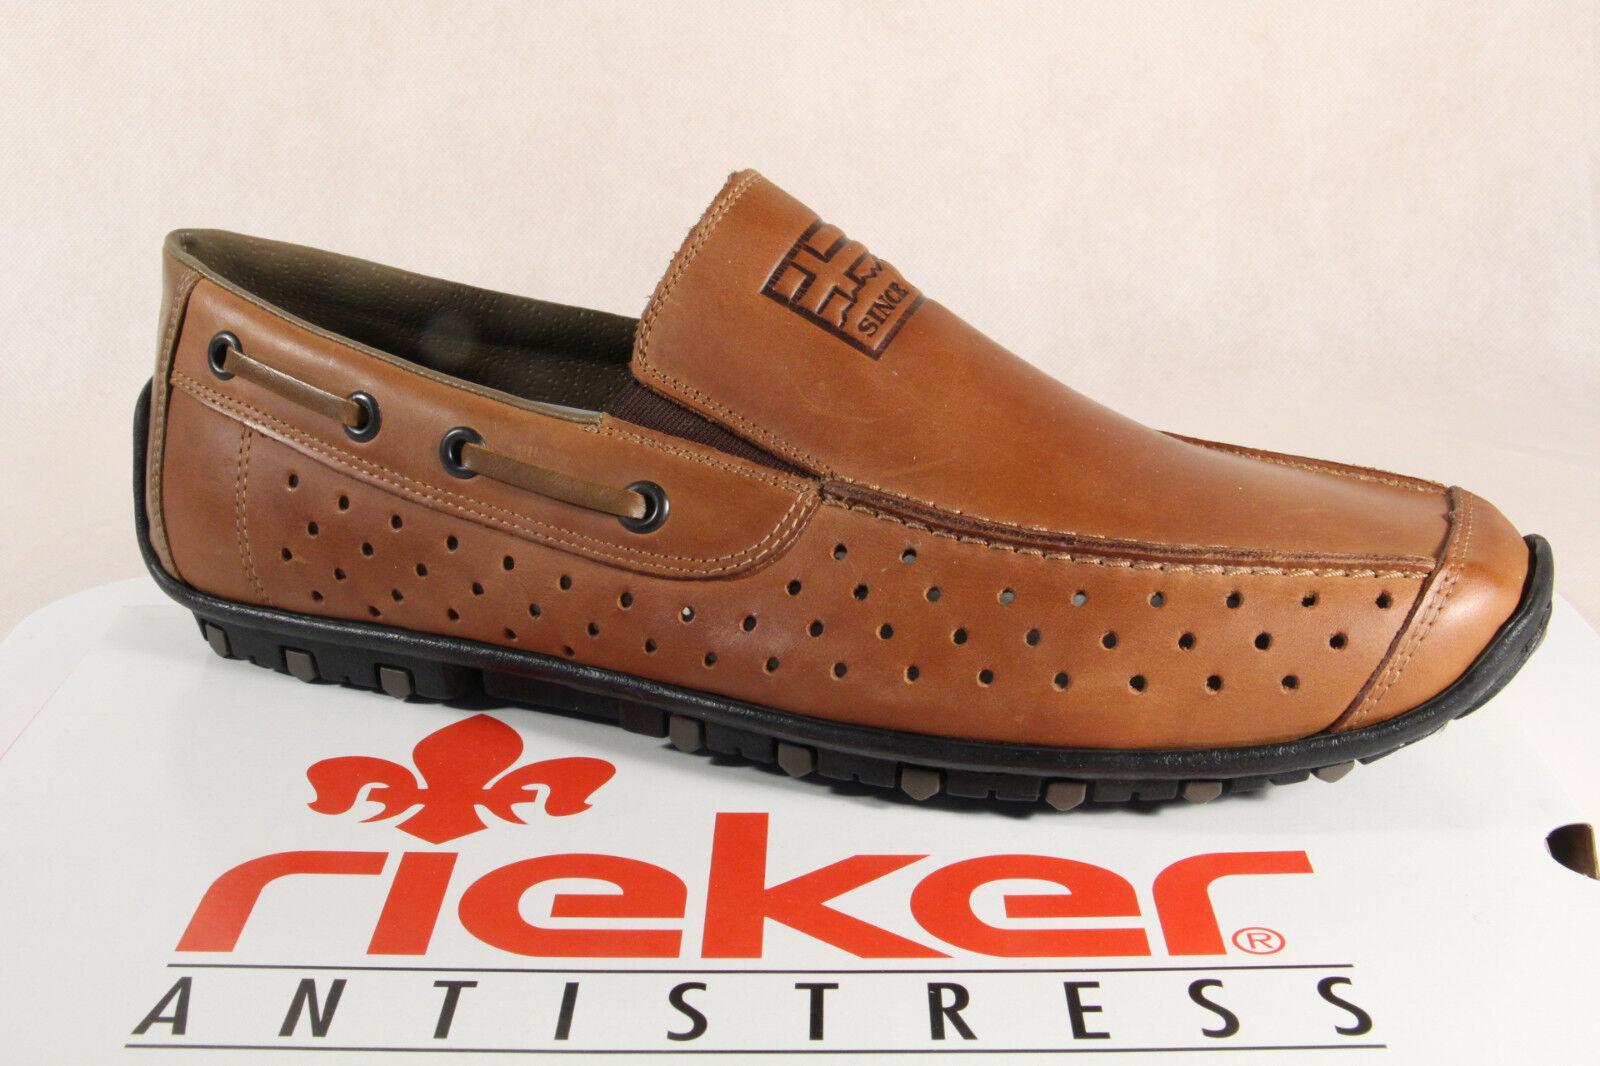 Rieker 08969 Herren Slipper Sneakers Halbschuhe 08969 Rieker braun Echtleder  NEU f41c16